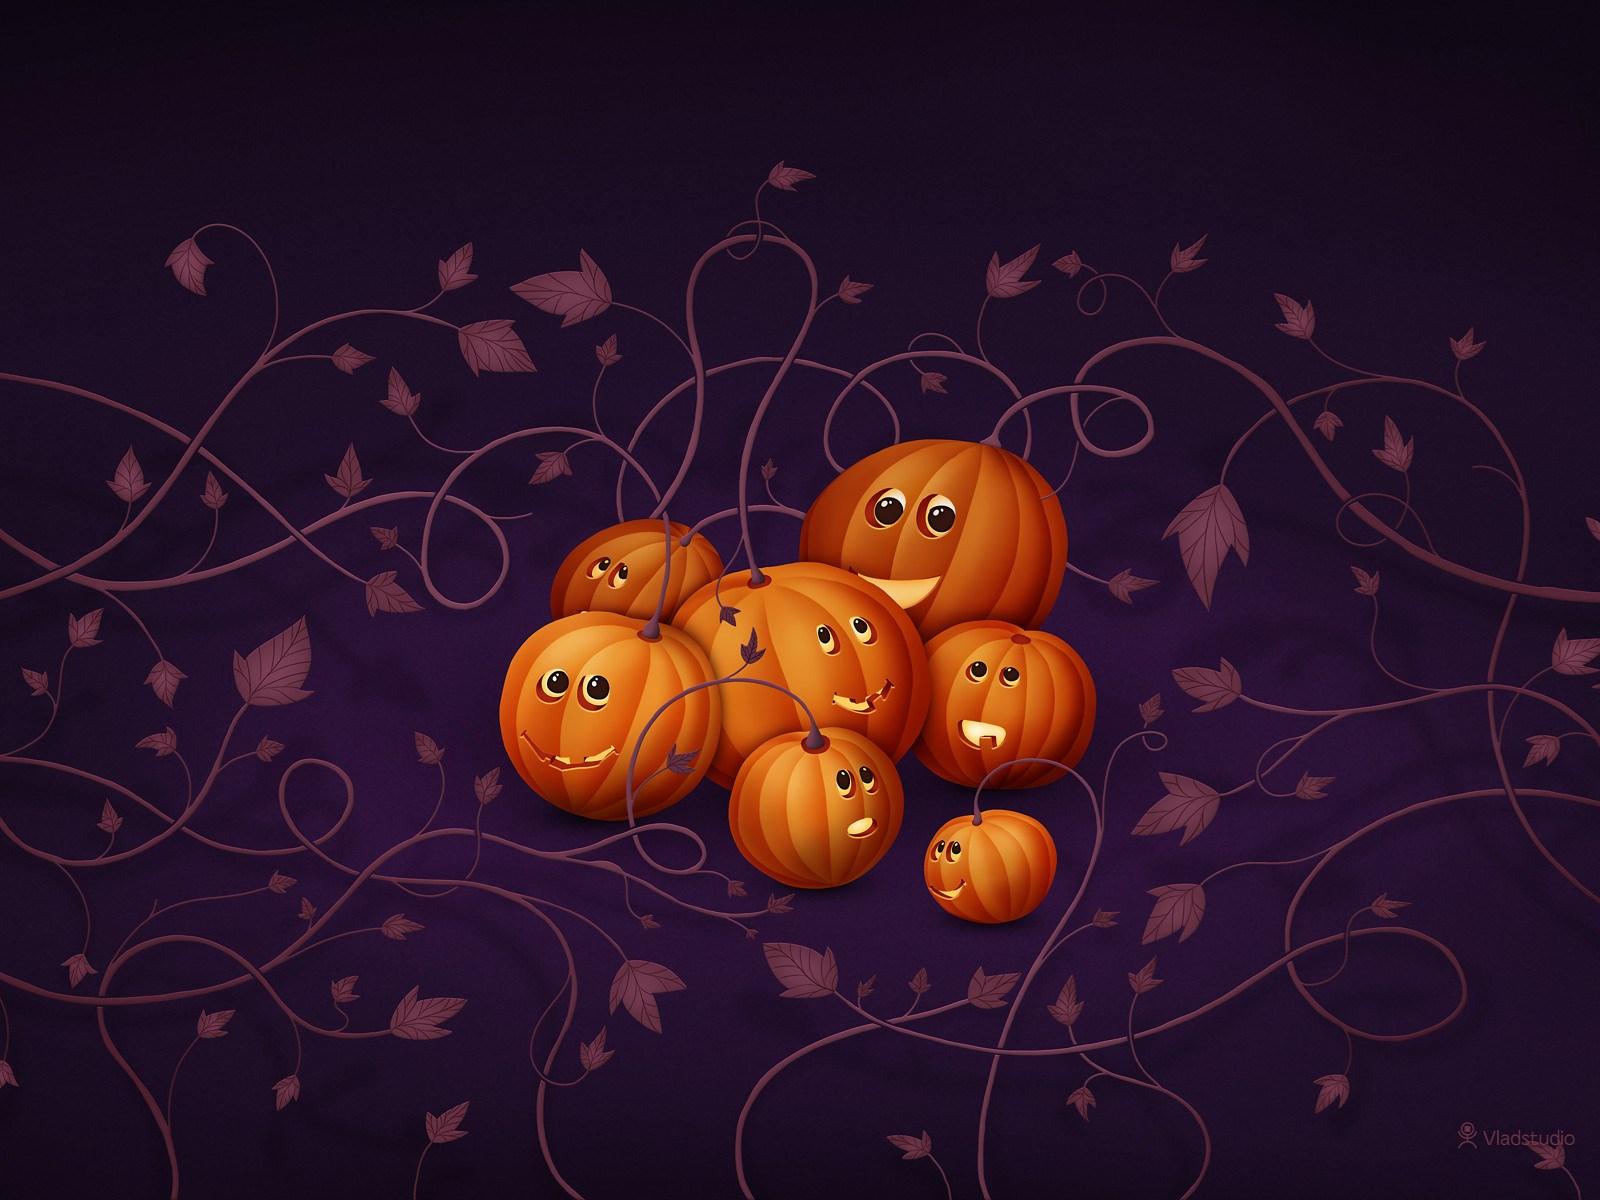 Happy_Halloween_Happy-Pumkins-2012-HD-Wallpaper1.jpg